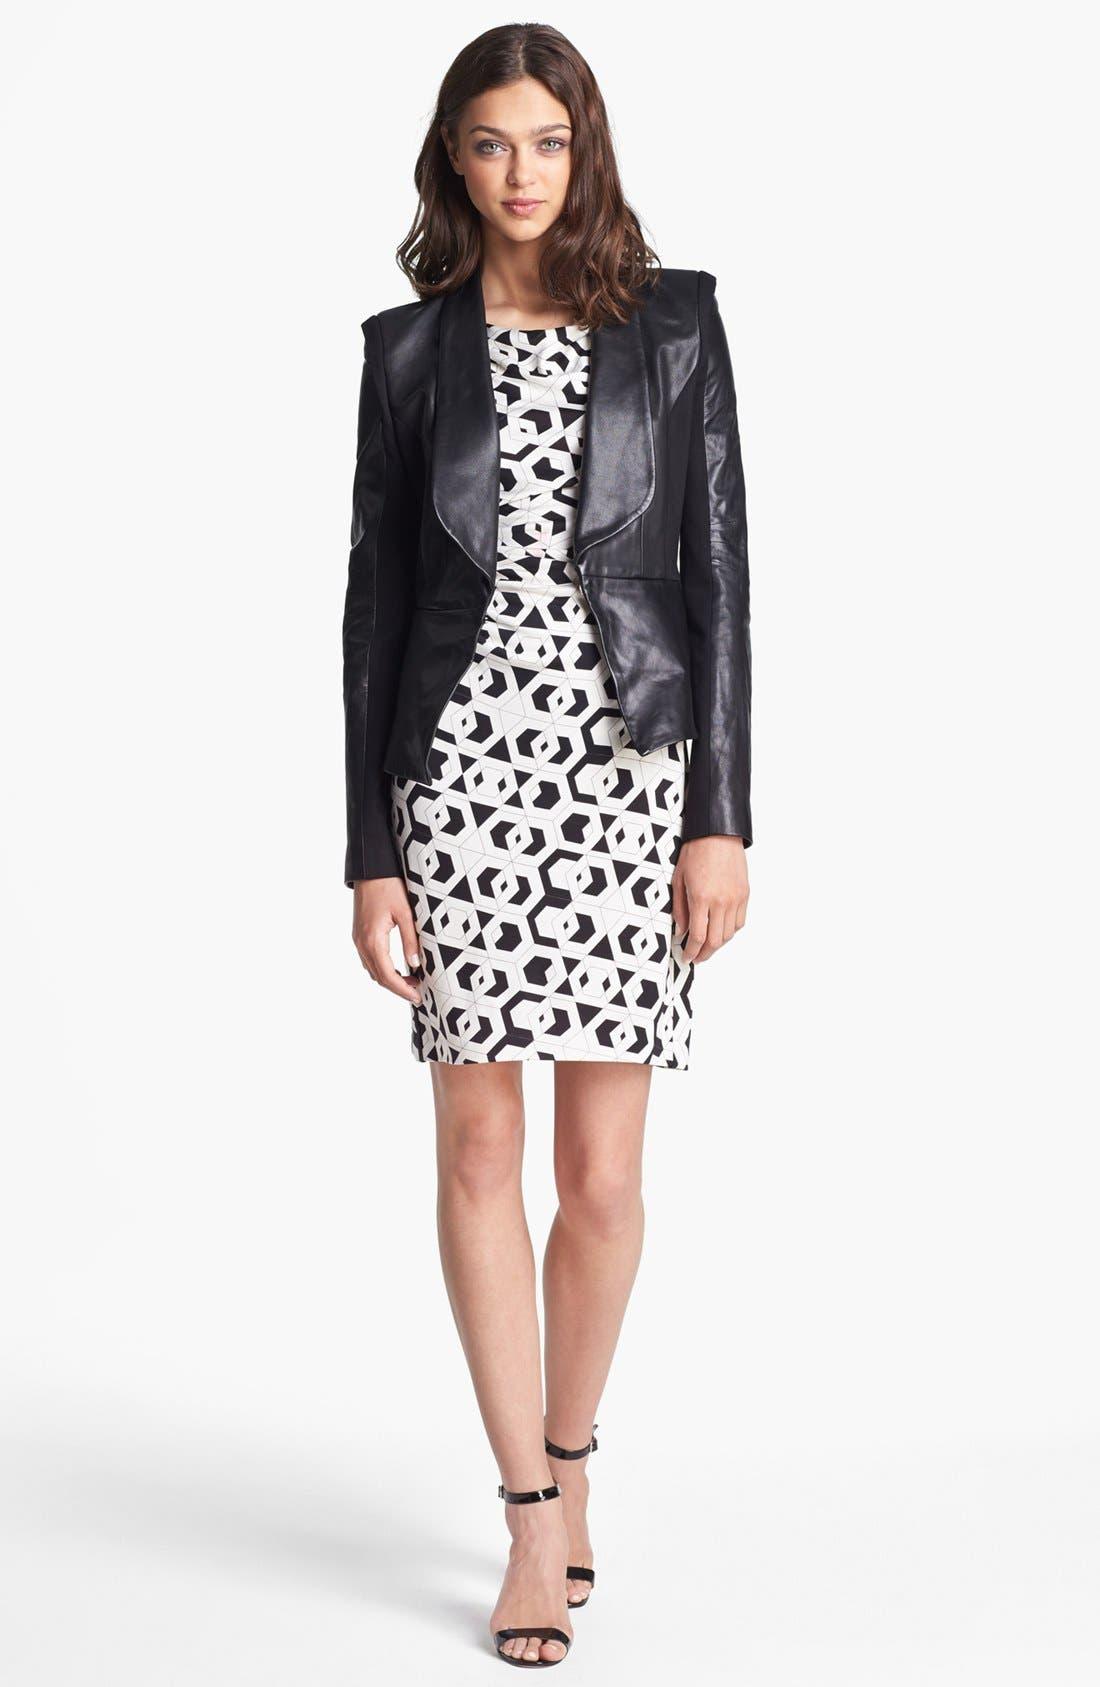 Main Image - Rebecca Minkoff 'Rebecca' Leather & Knit Jacket